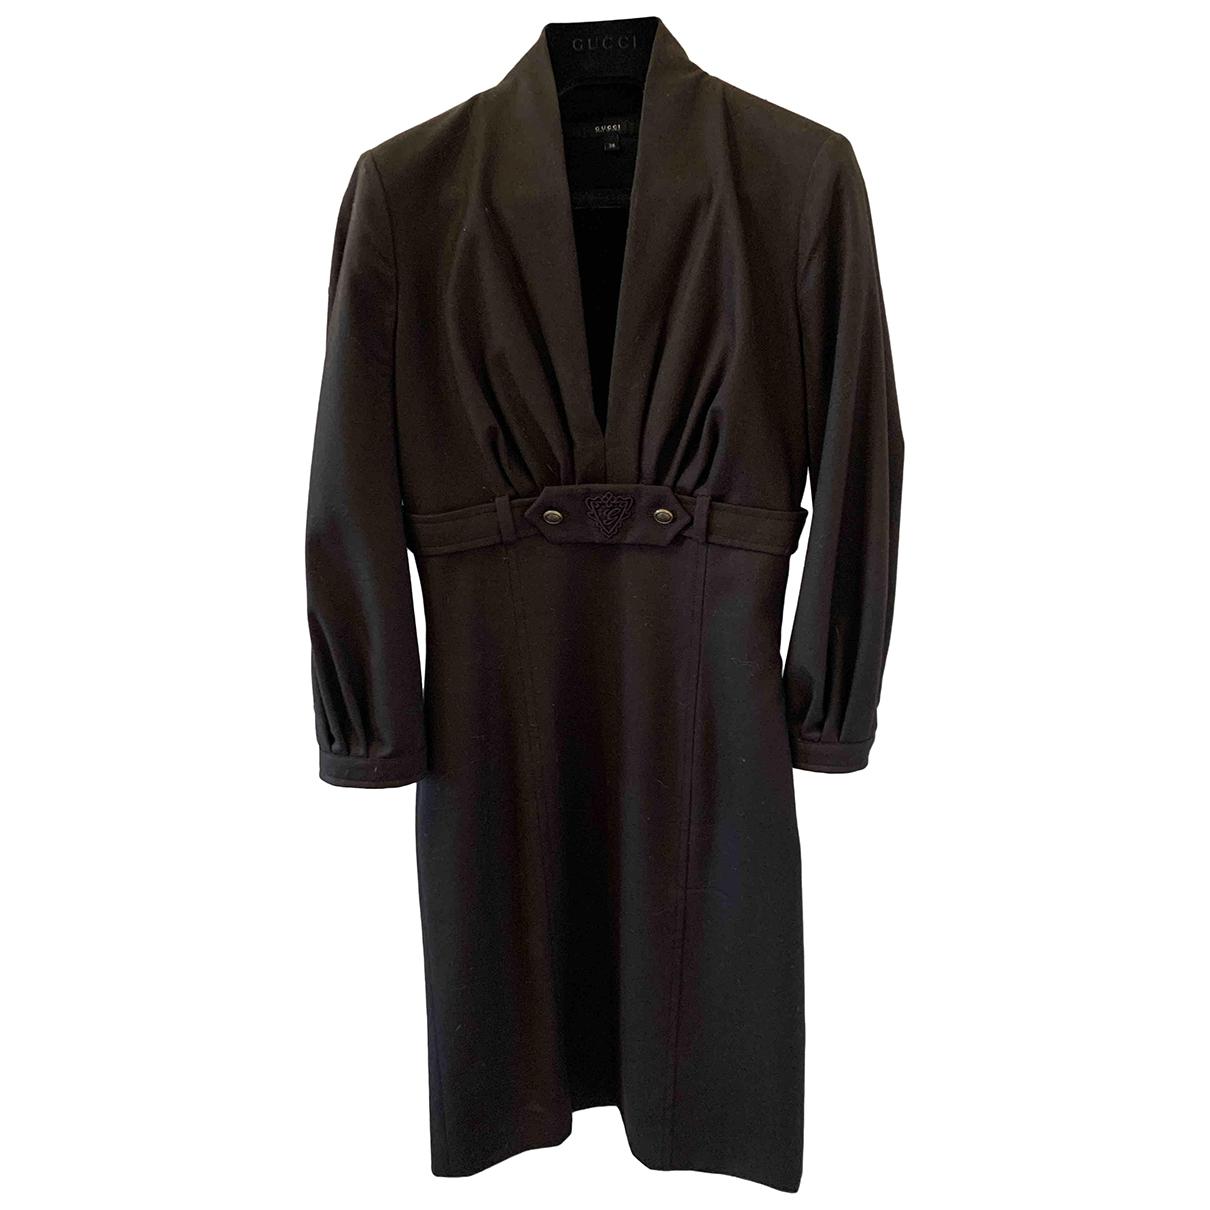 Gucci \N Brown Wool dress for Women 38 IT